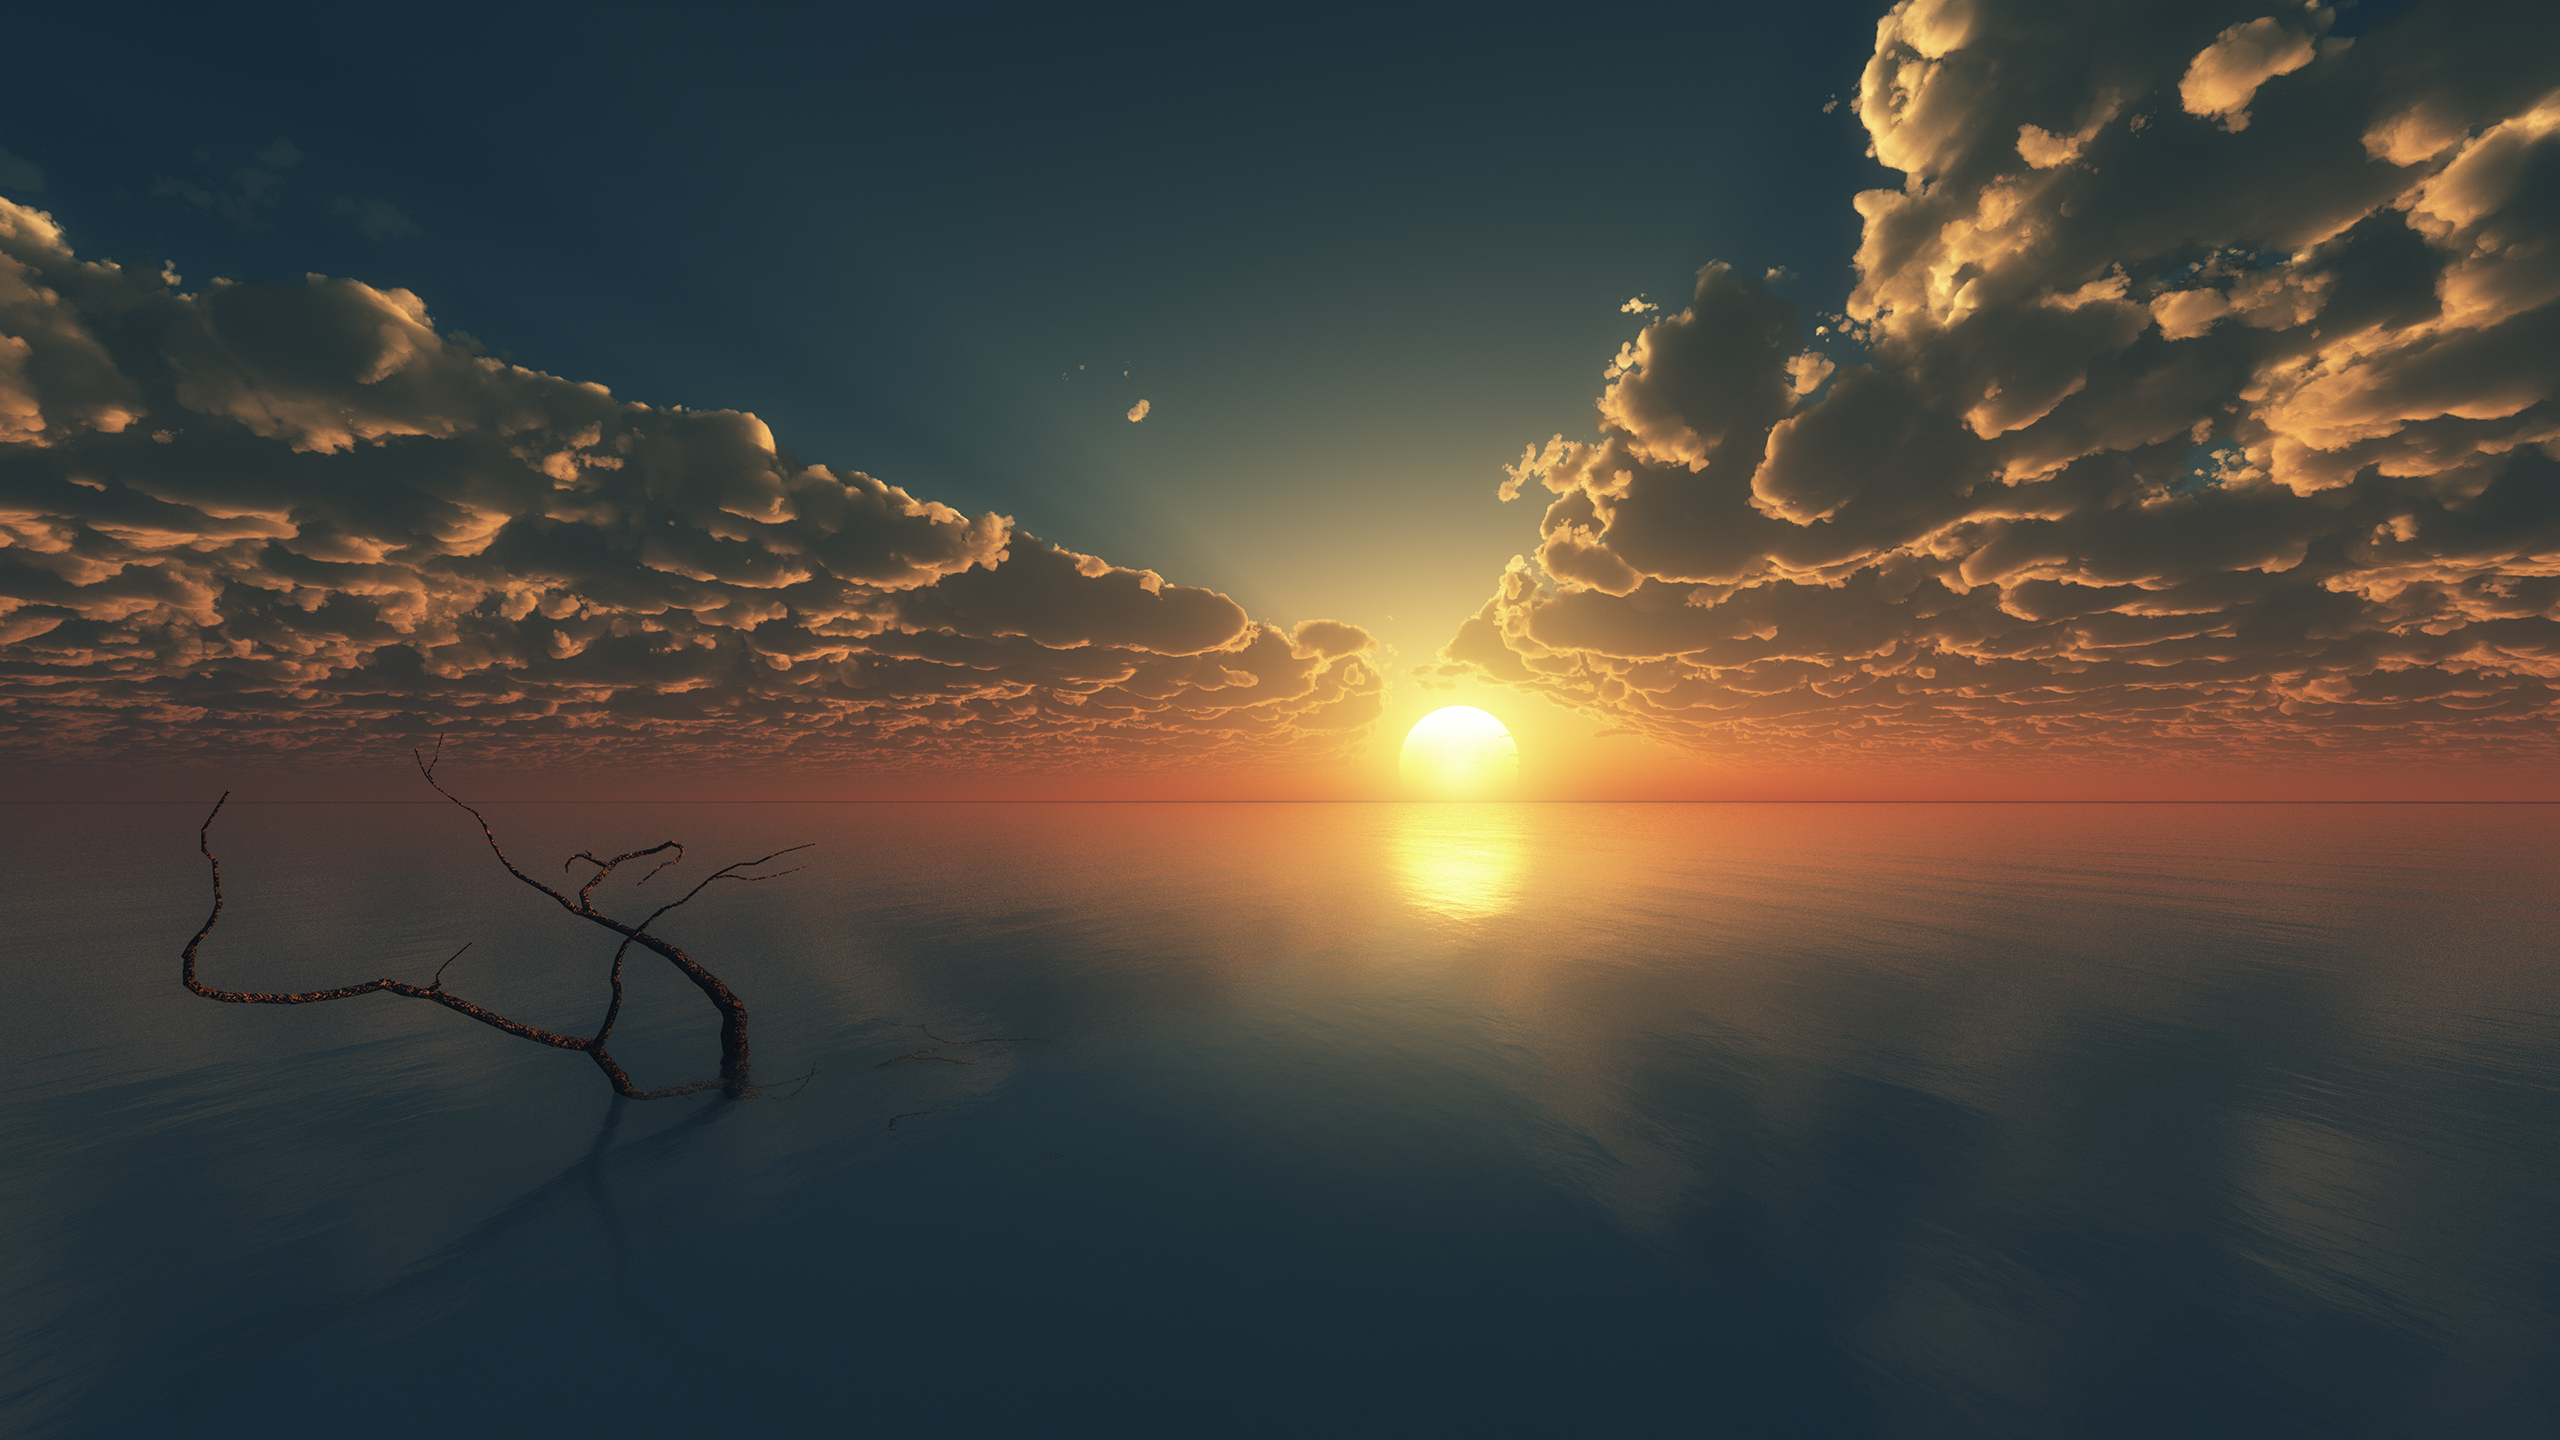 sunset_2560x1440